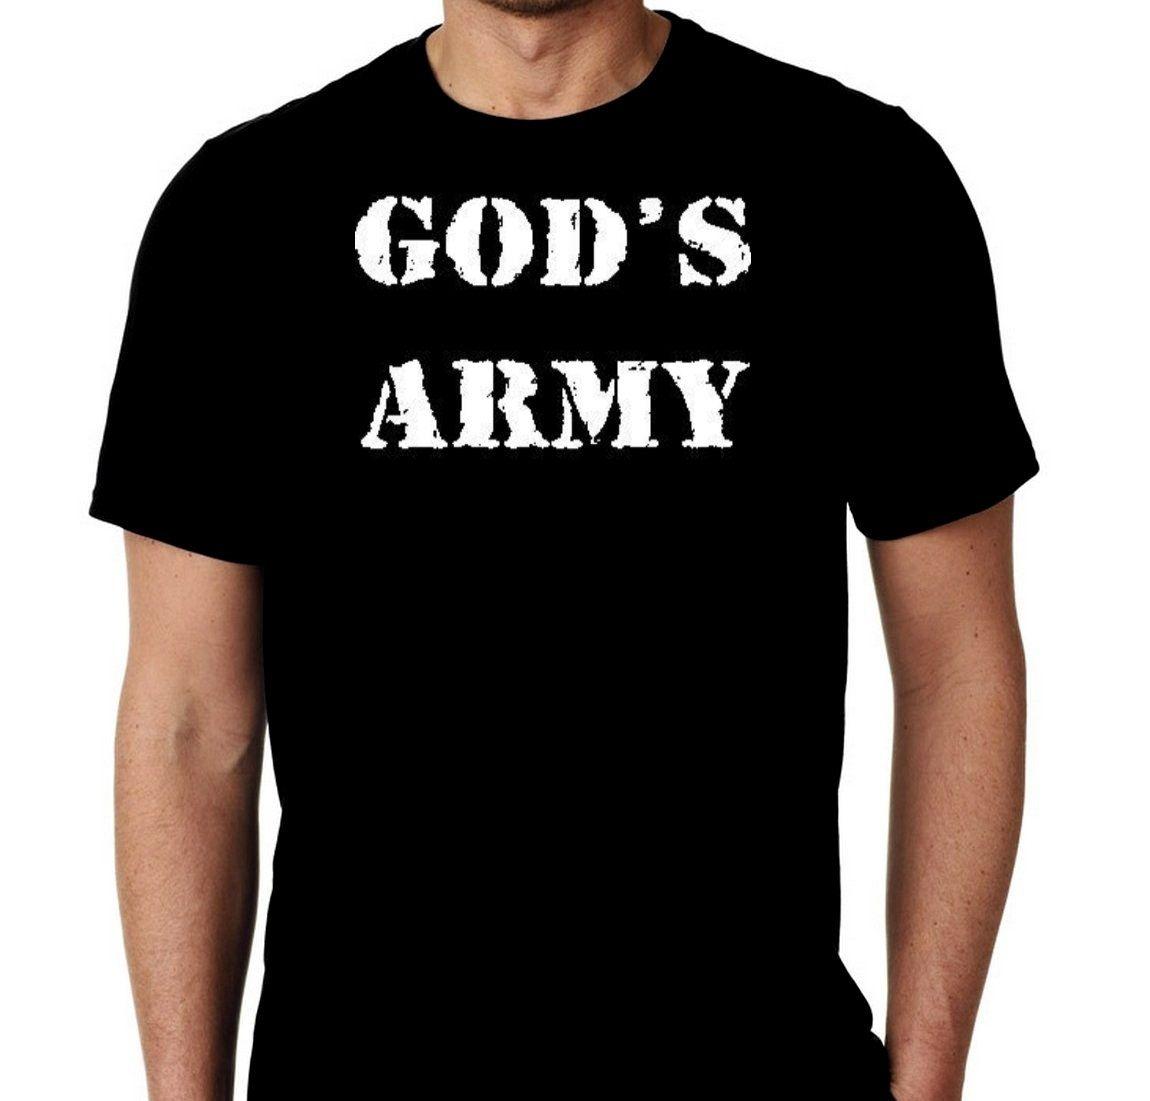 New Gods Army Religious Custom Tshirt Small - 4XL Free Shipping by MarieLynnTshirt on Etsy